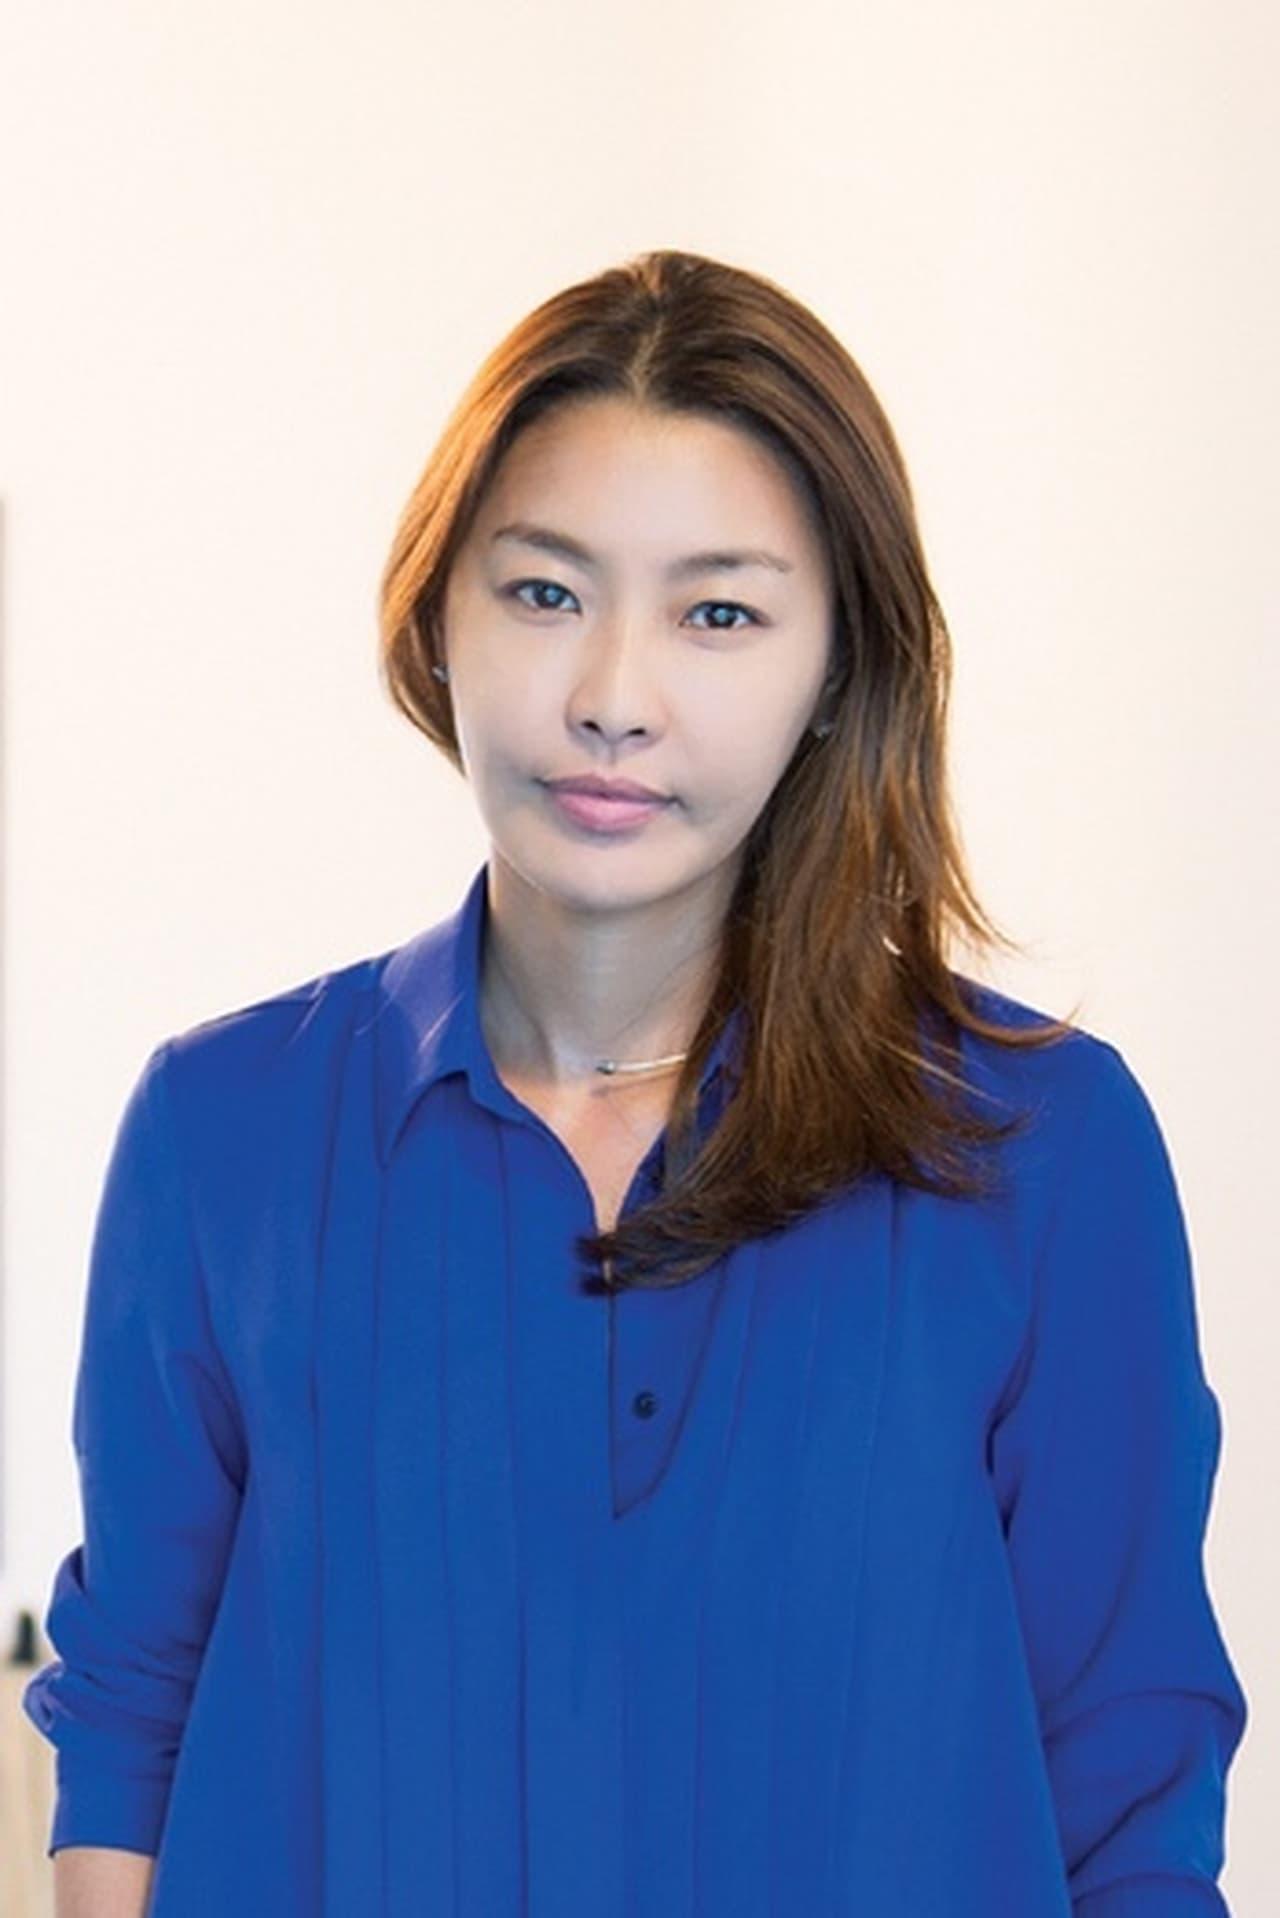 Choi Se-yeon